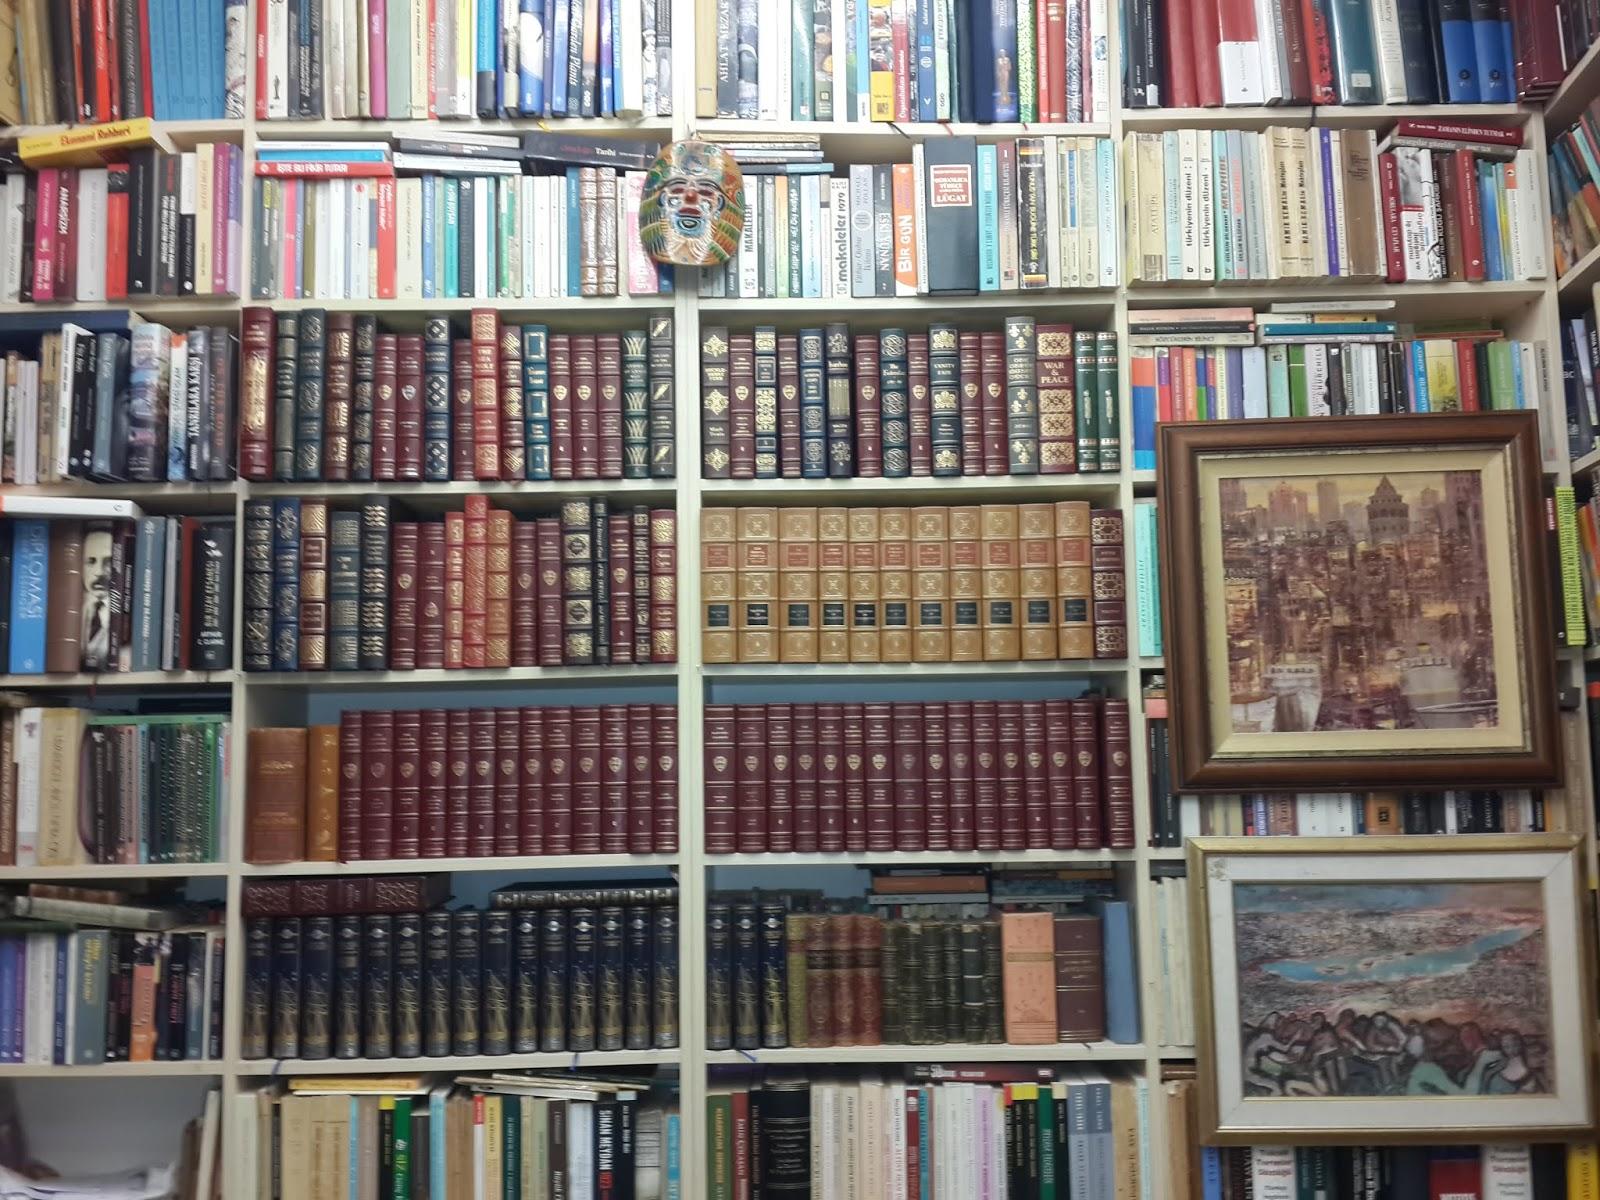 marti sahaf ikinci el kitap alinir eski kitap alanlar 0545 975 99 10